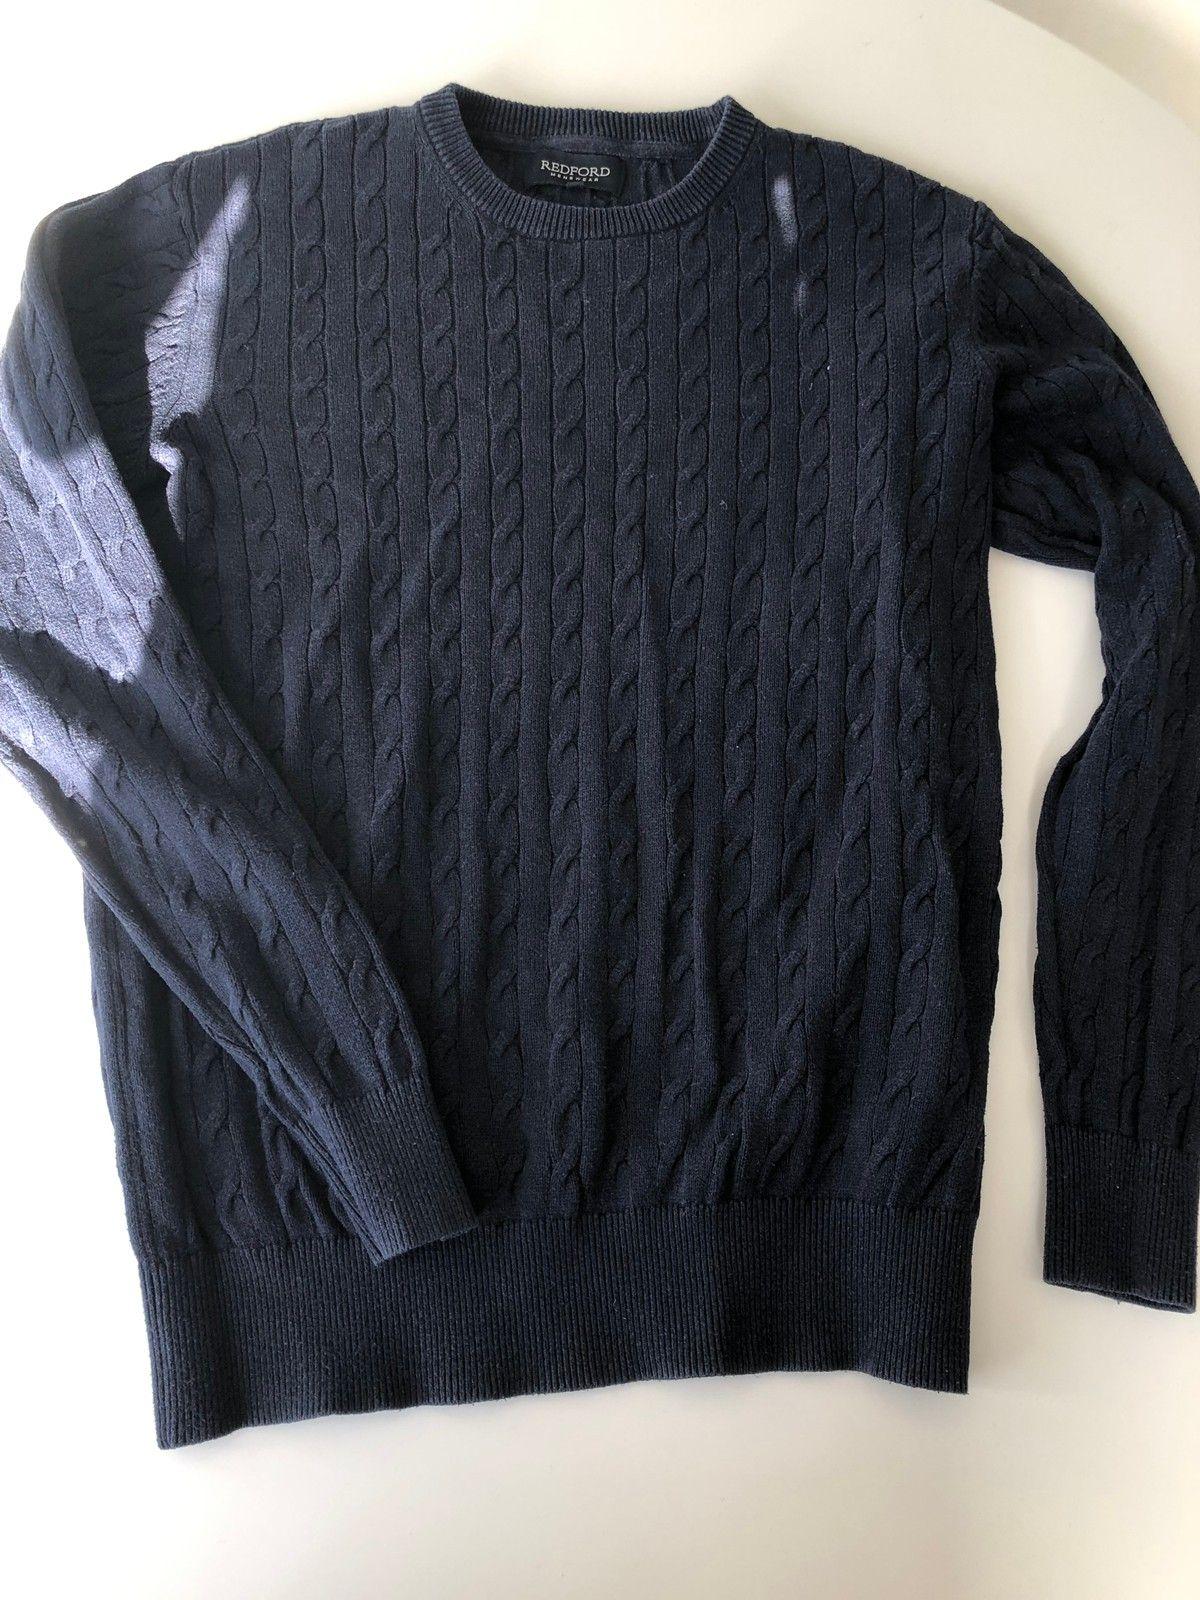 Ny genser merke Redford str xxxl | FINN.no